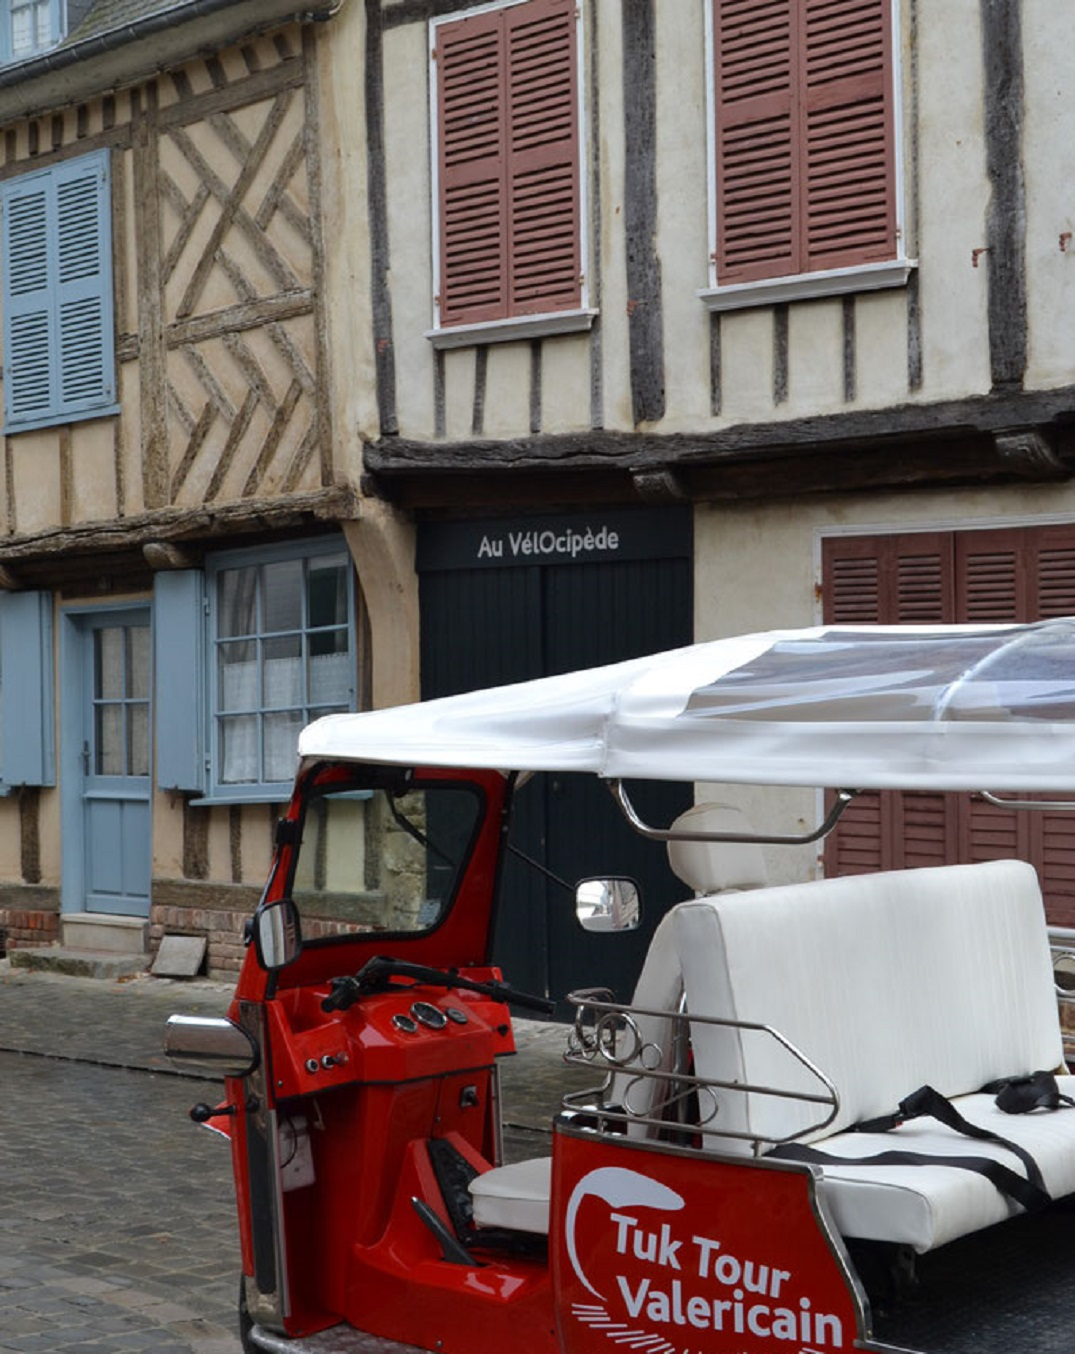 OtBaiedeSomme-Tuk Tour3-Saint-Valery-sur-Somme